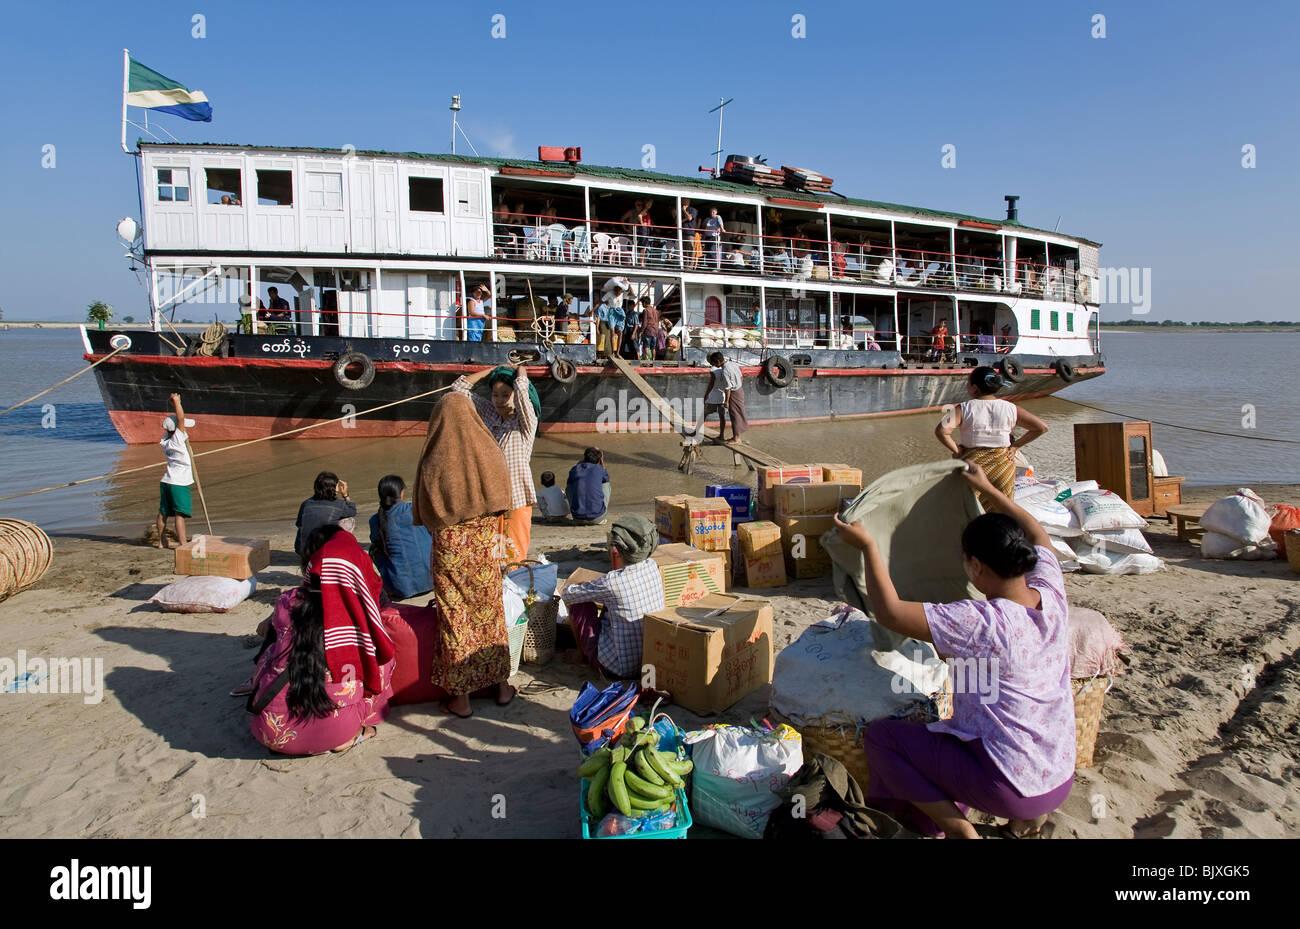 Boat stopover on the route Mandalay-Bagan. Pakokku. Ayeyarwady river. Myanmar - Stock Image